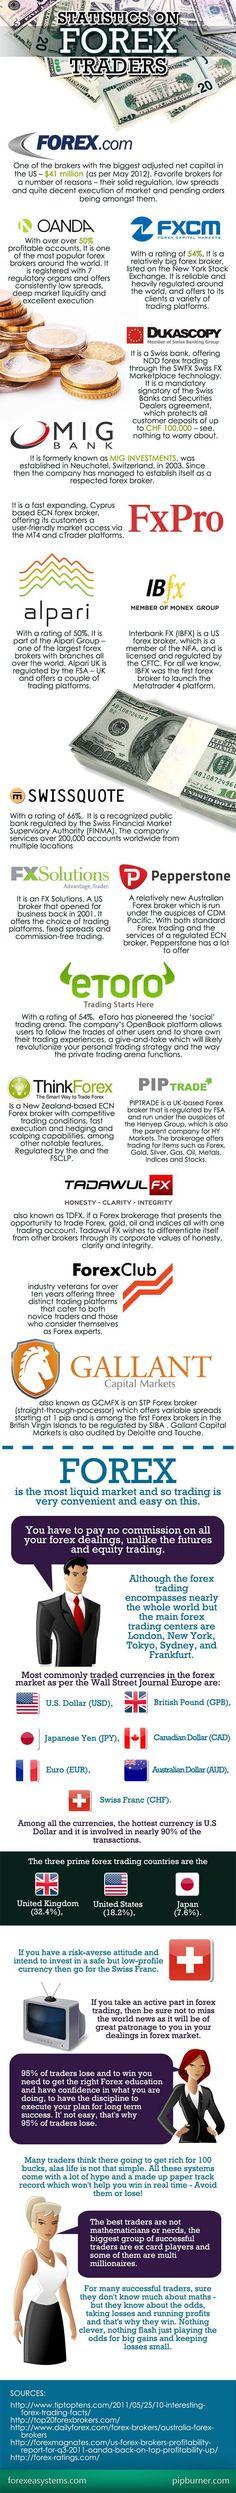 PROFITABLE.CC | www.Profitable.cc #OctaFX #Forex #Broker #MakeMoney #BestSites #TopSites #ForexBestSites #MakeMoneyForex #Profit #Trade #Stock #Opportunities #Trader #Binary #Currency #ForexAccounts #ForexSignals #MostTraded